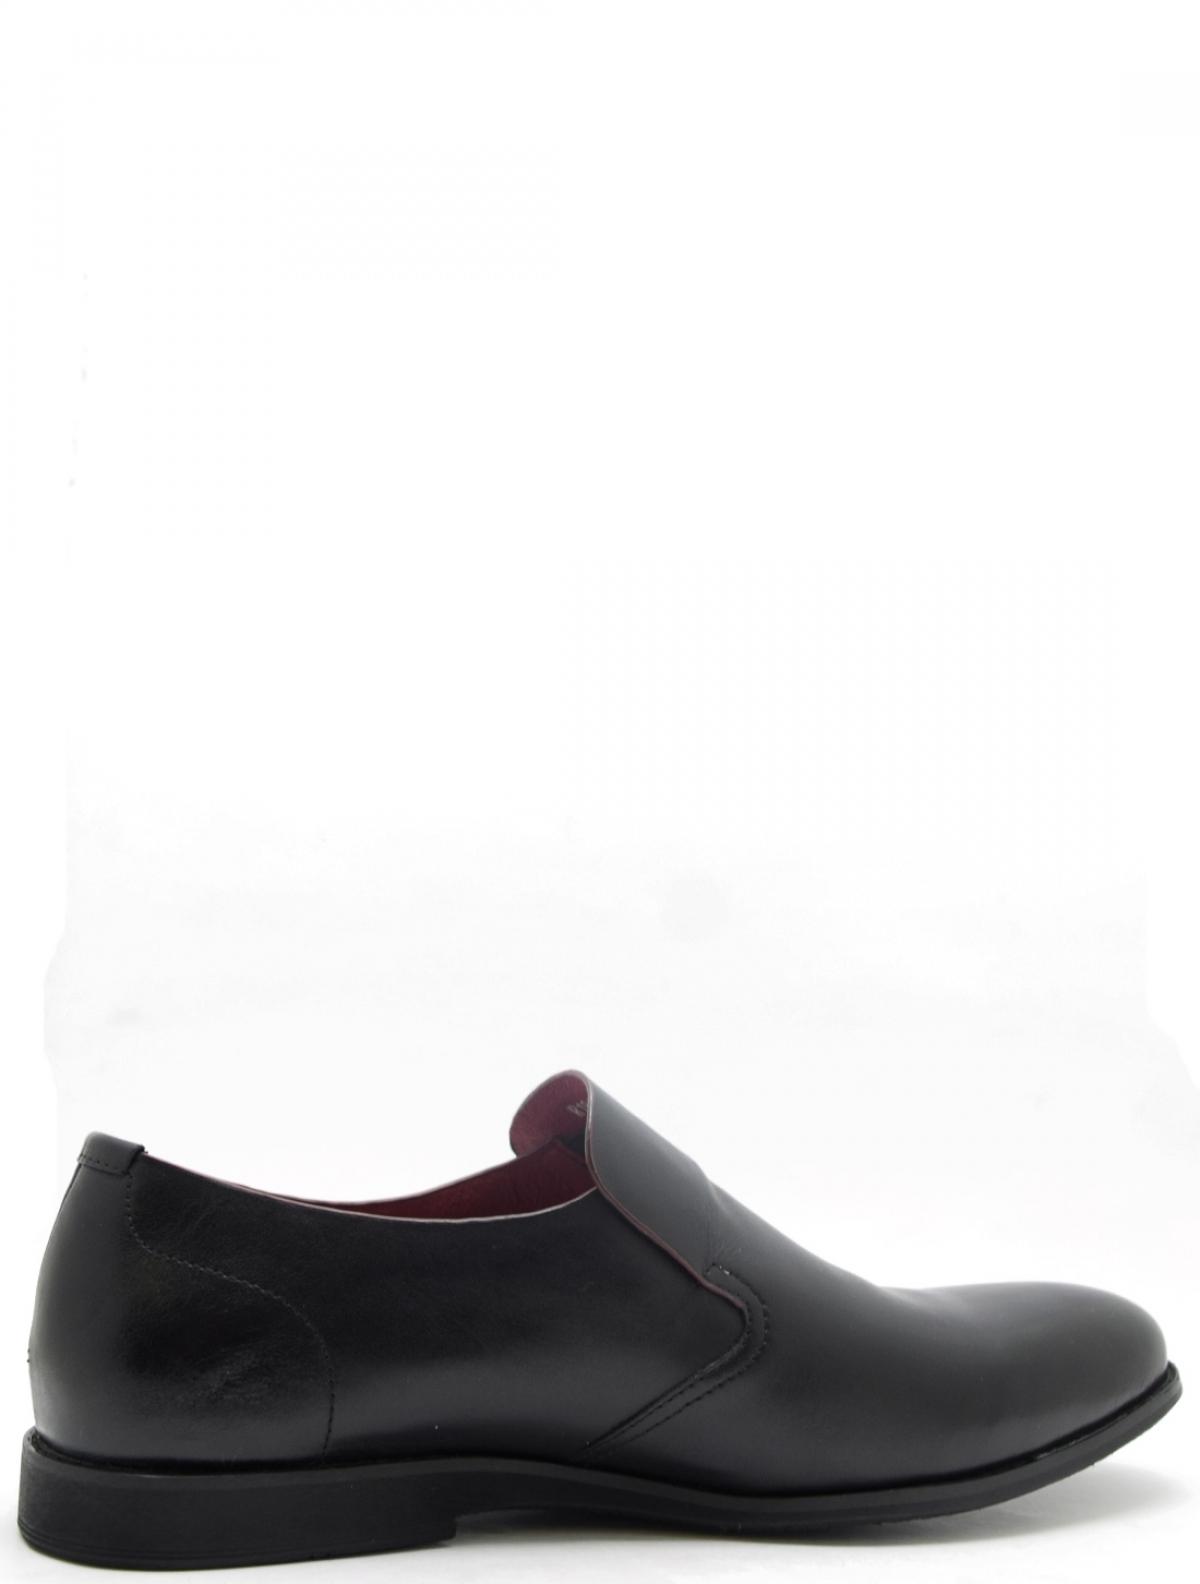 Roscote R181507-A1-T2590 мужские туфли